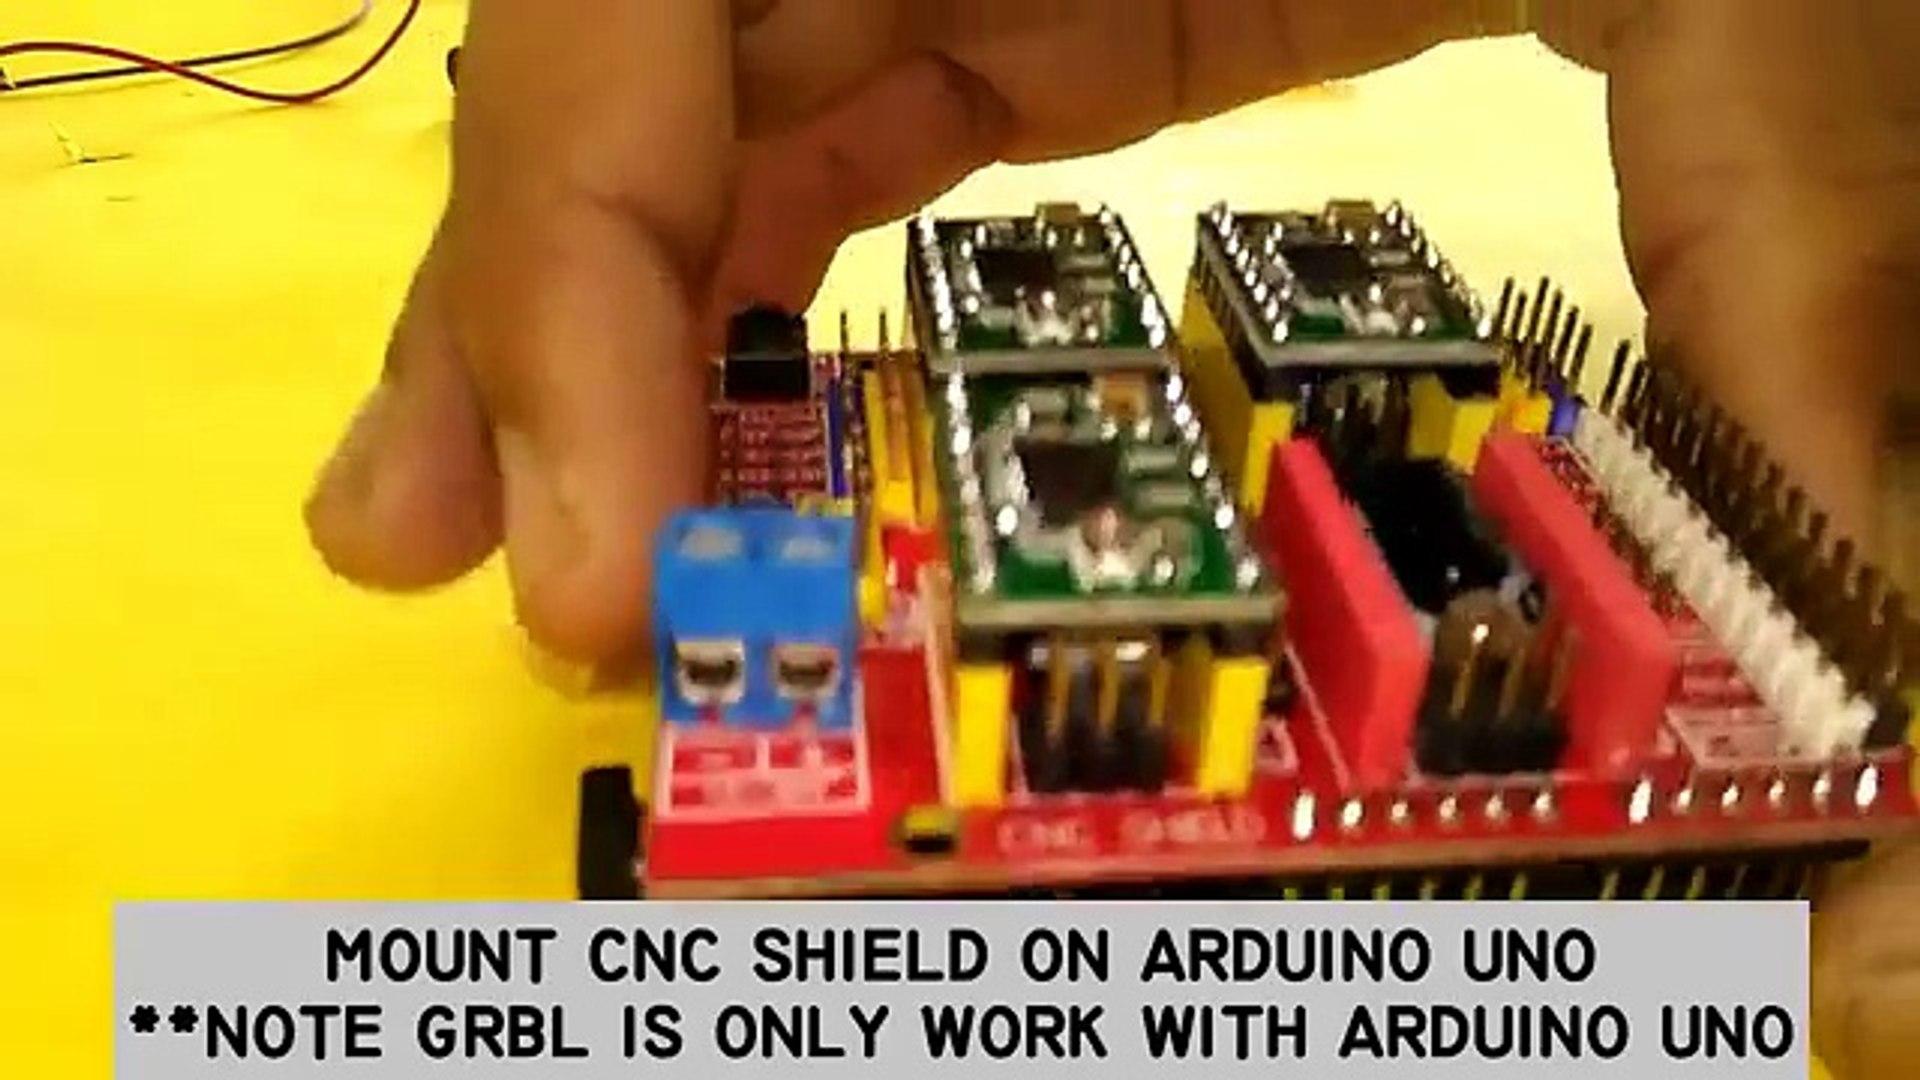 Basic setup ArduinoUNO + CNC SHIELD + GRBL + 3 X DVD Drive steppers